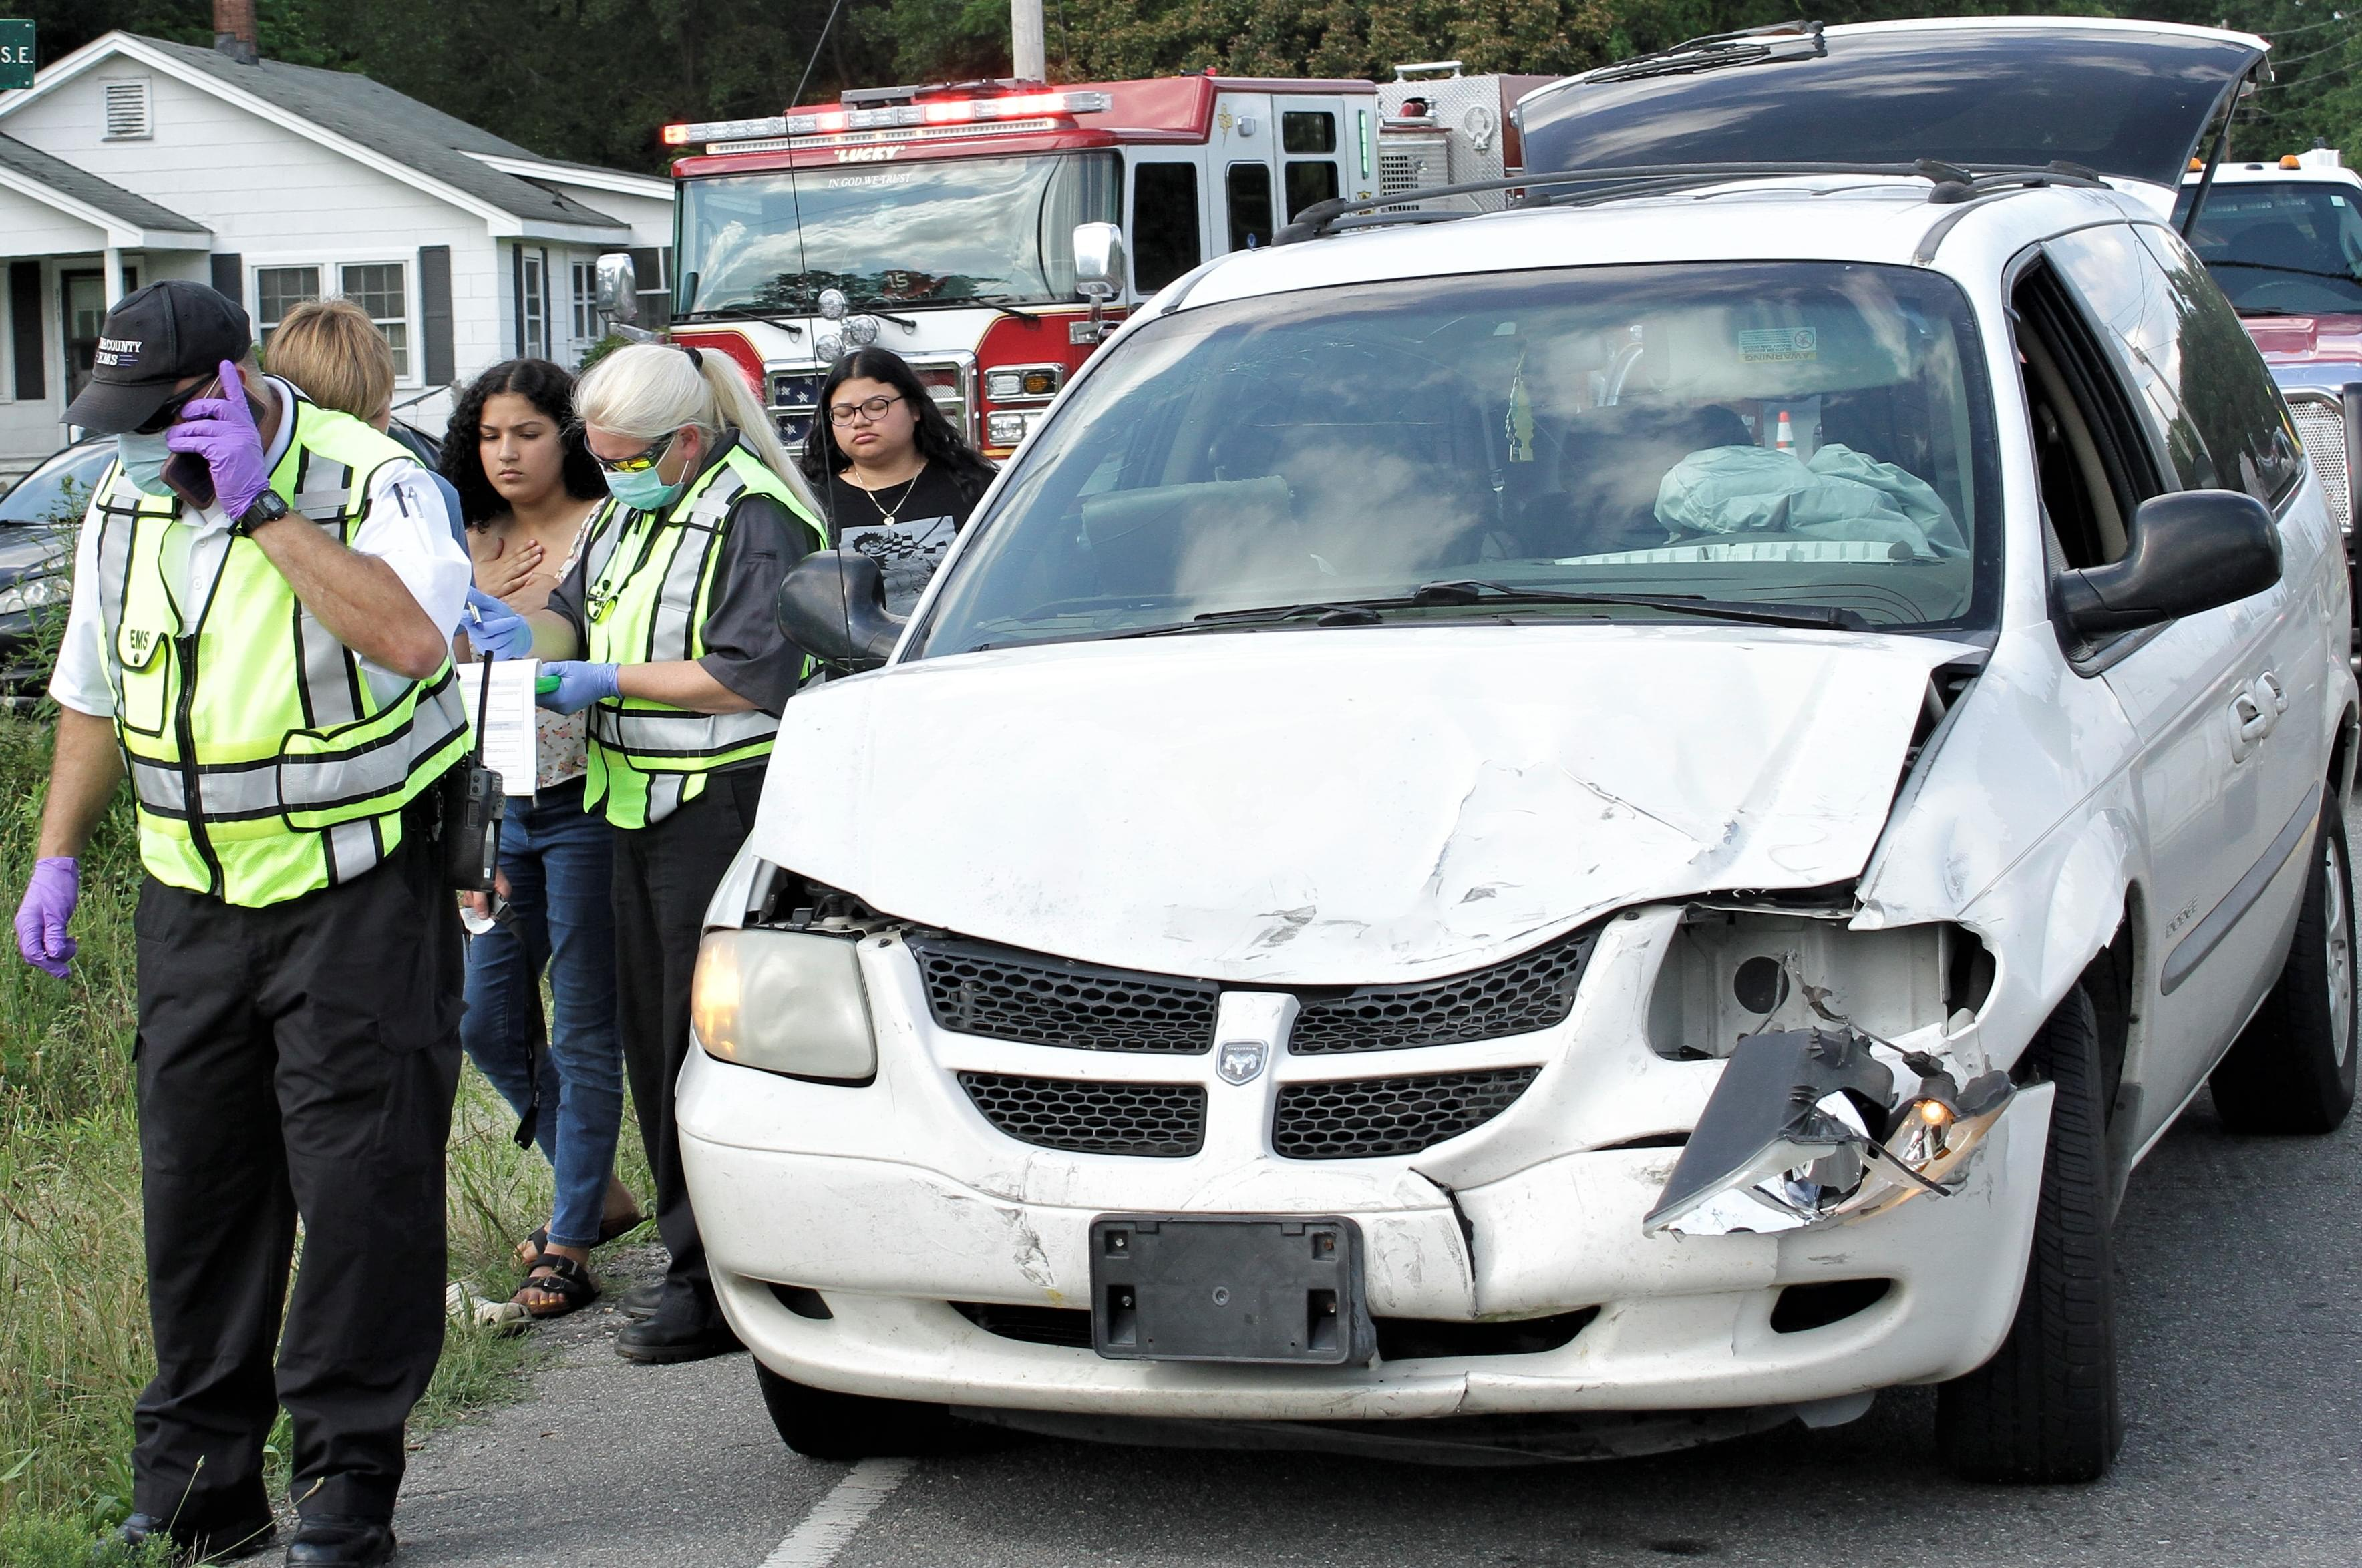 Vehicles Collide In Mar-Mac (PHOTOS)